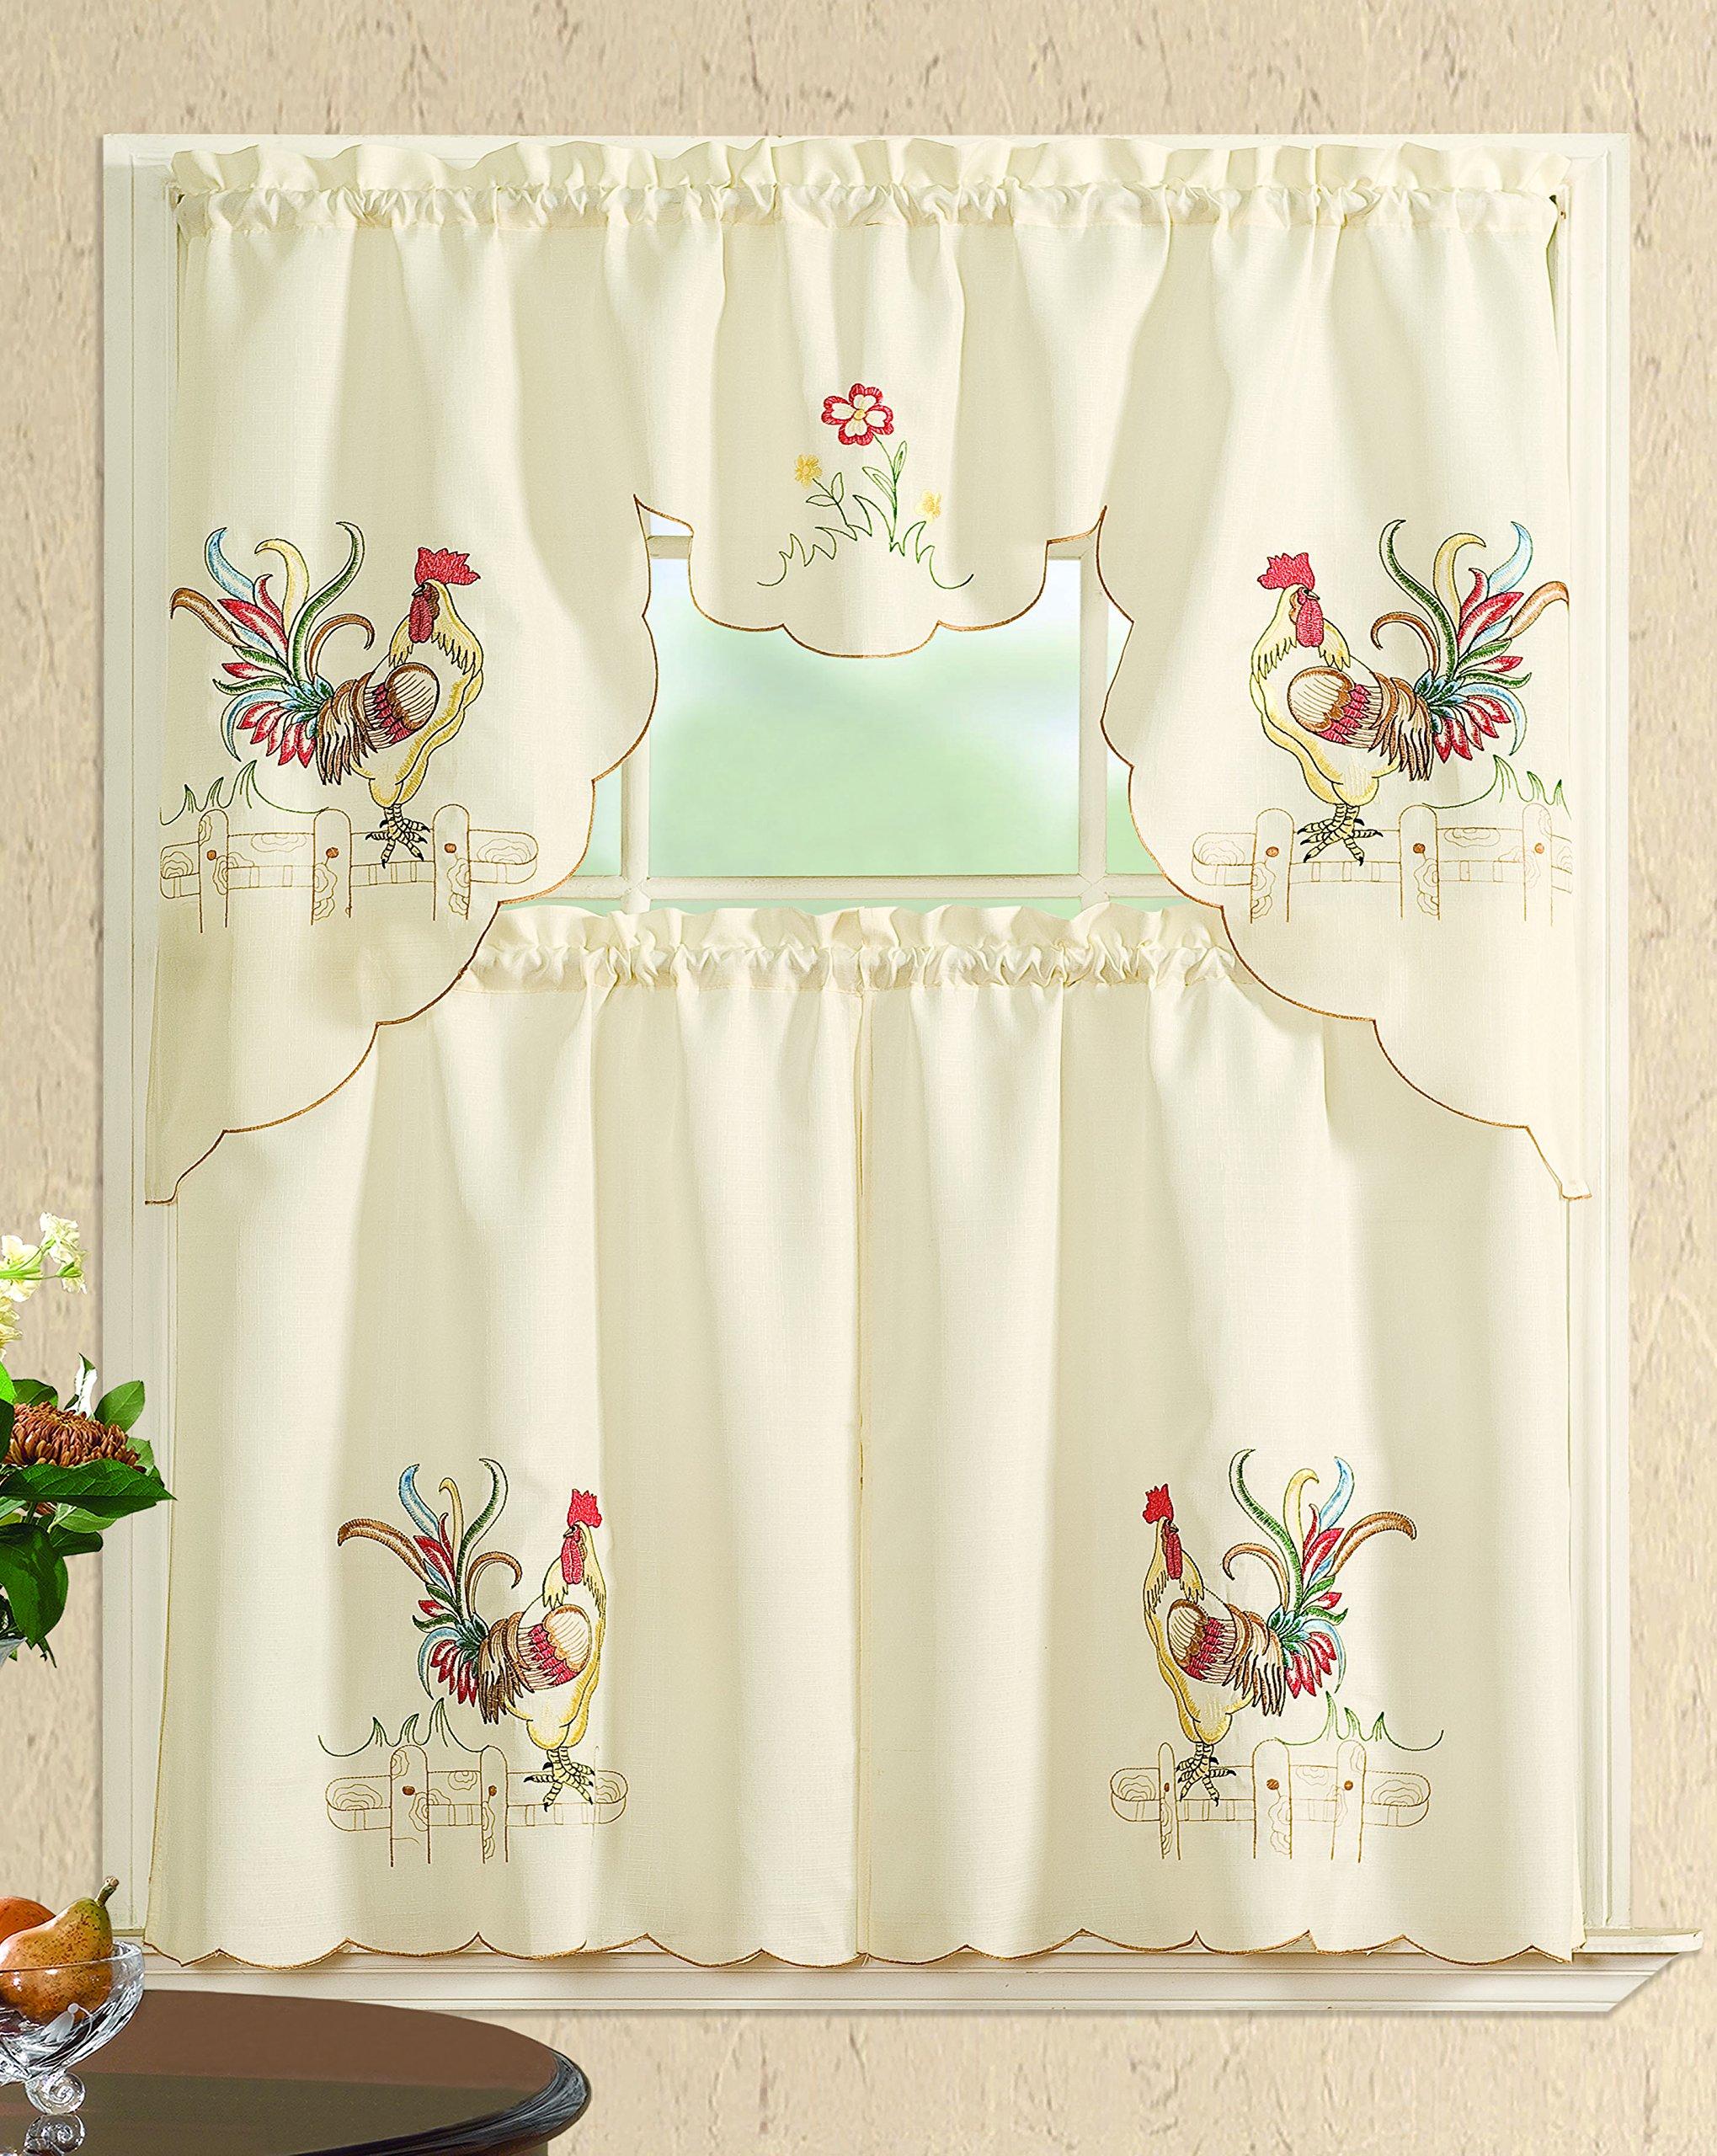 Rooster Kitchen Curtains Best Deals On New Kitchen Curtains Superofferscom